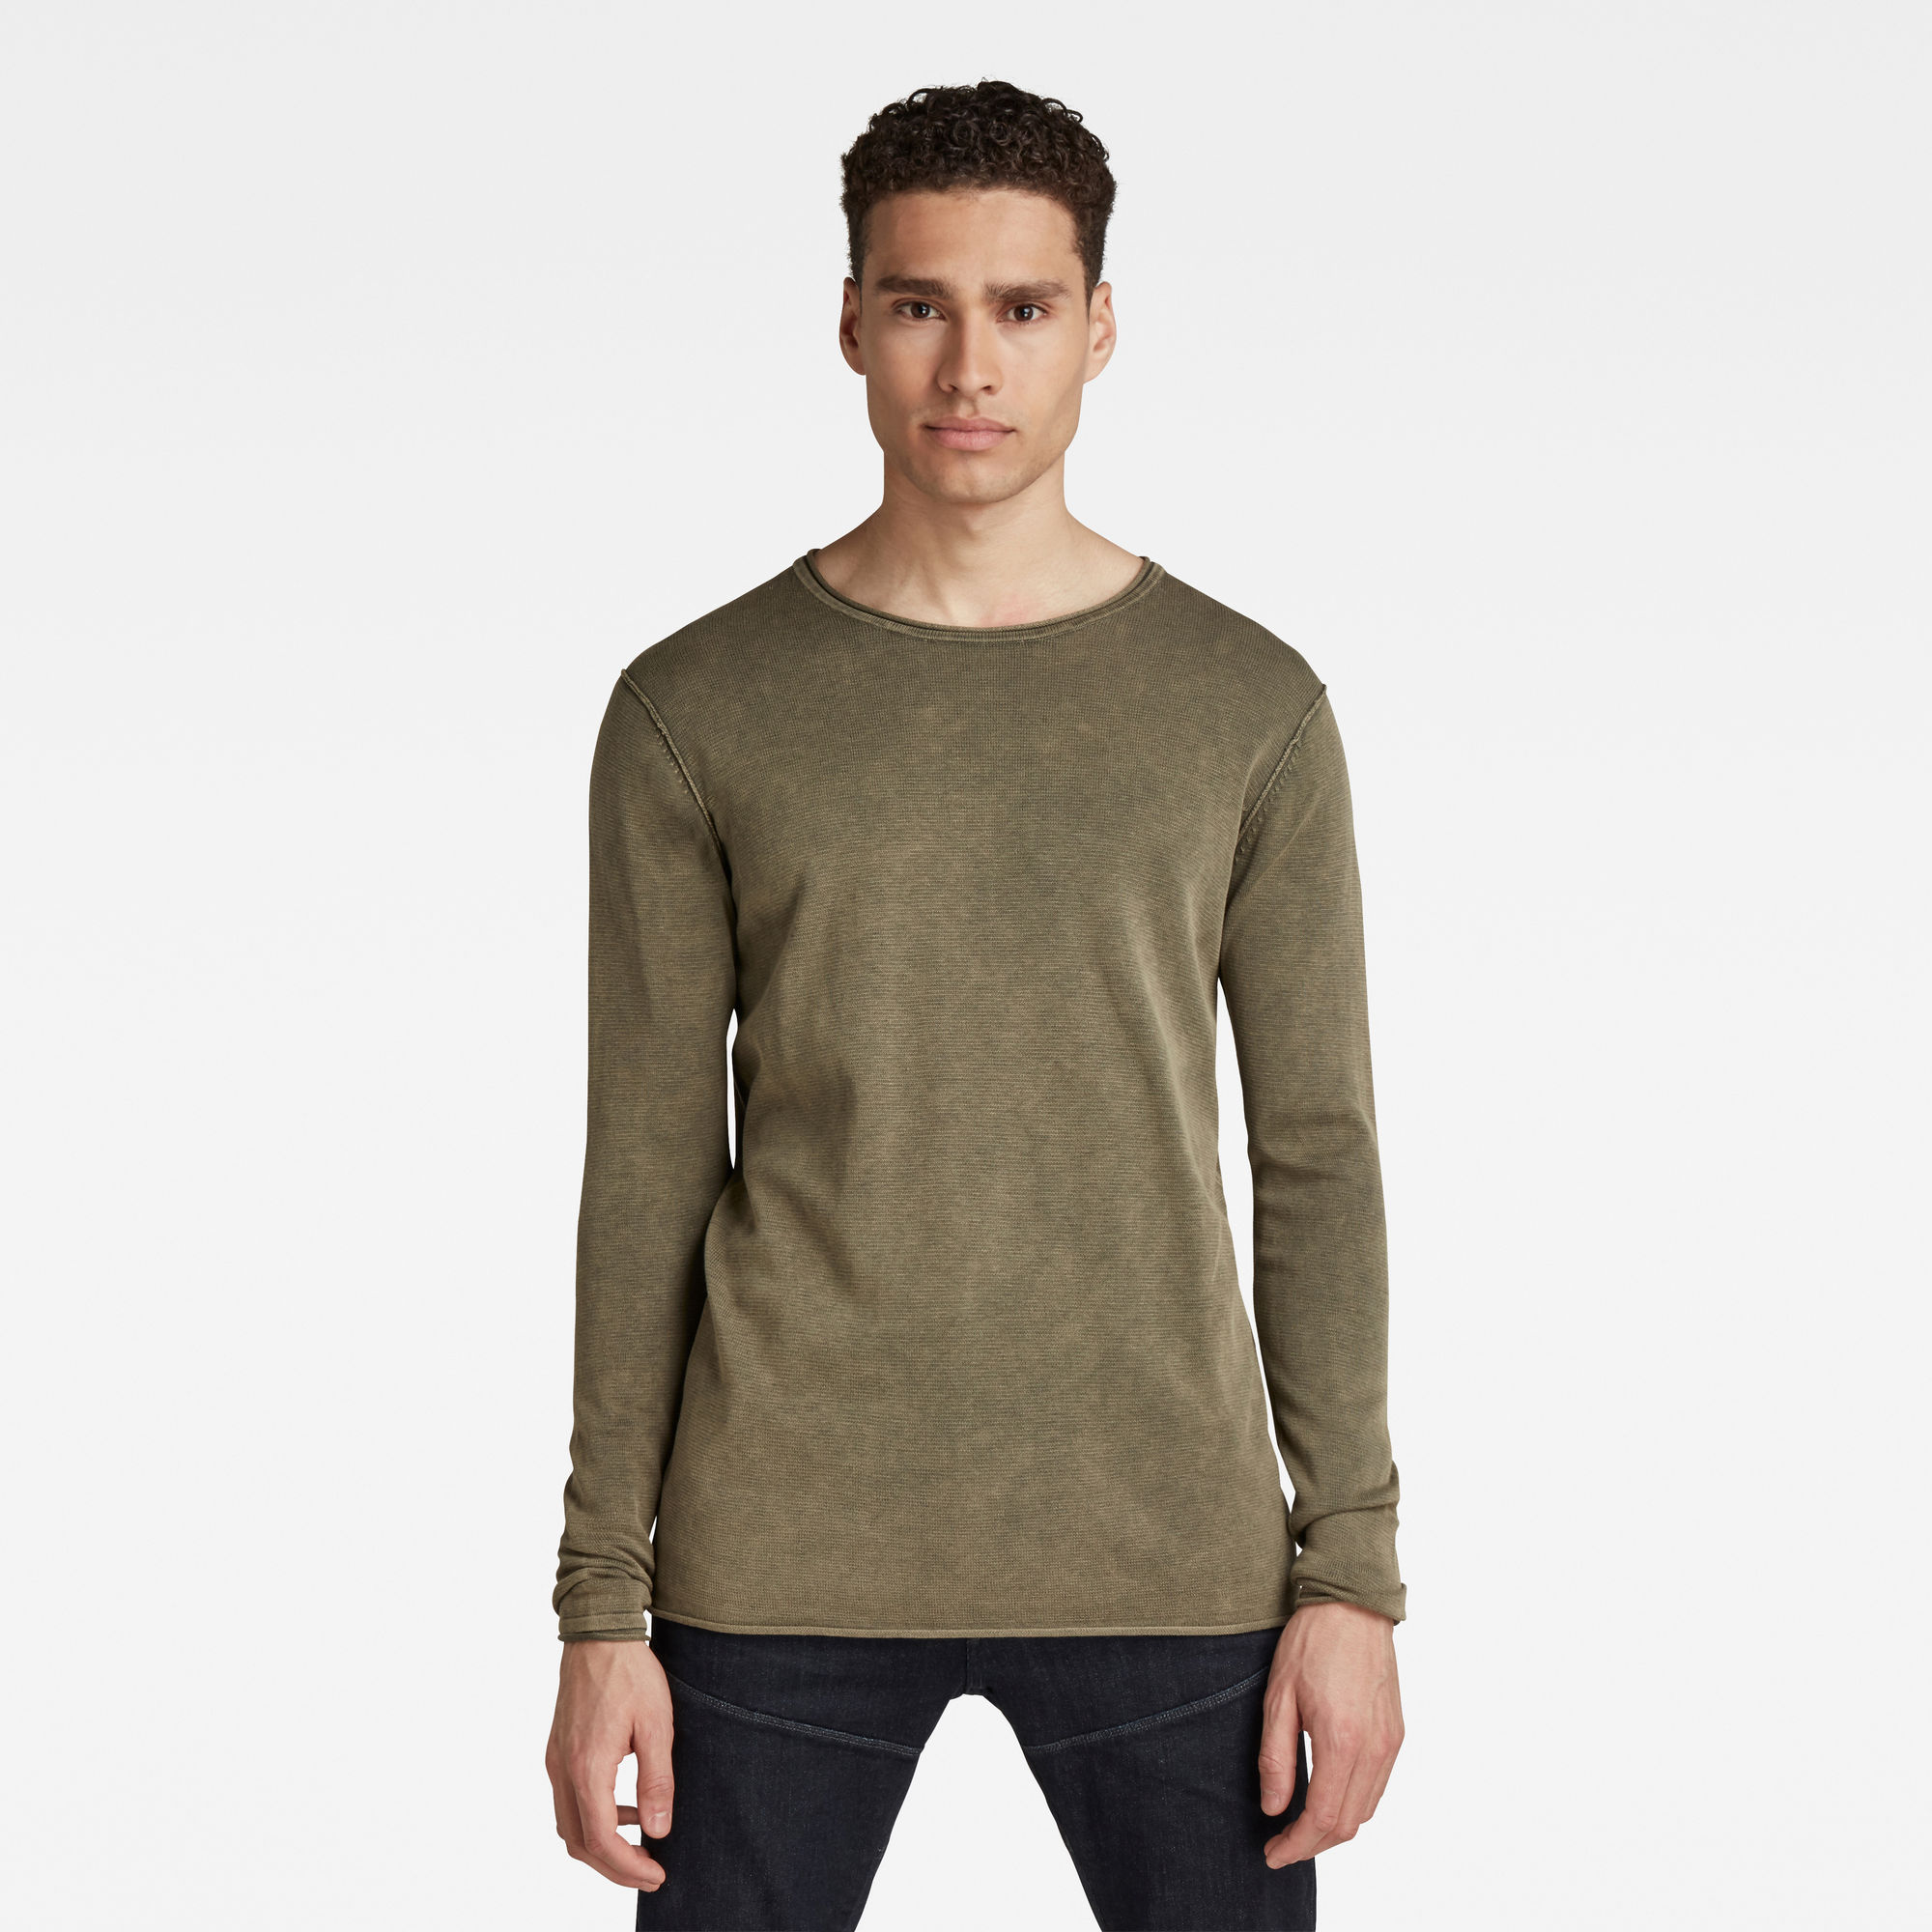 G-Star RAW Heren Bronek Knitted Sweater Groen